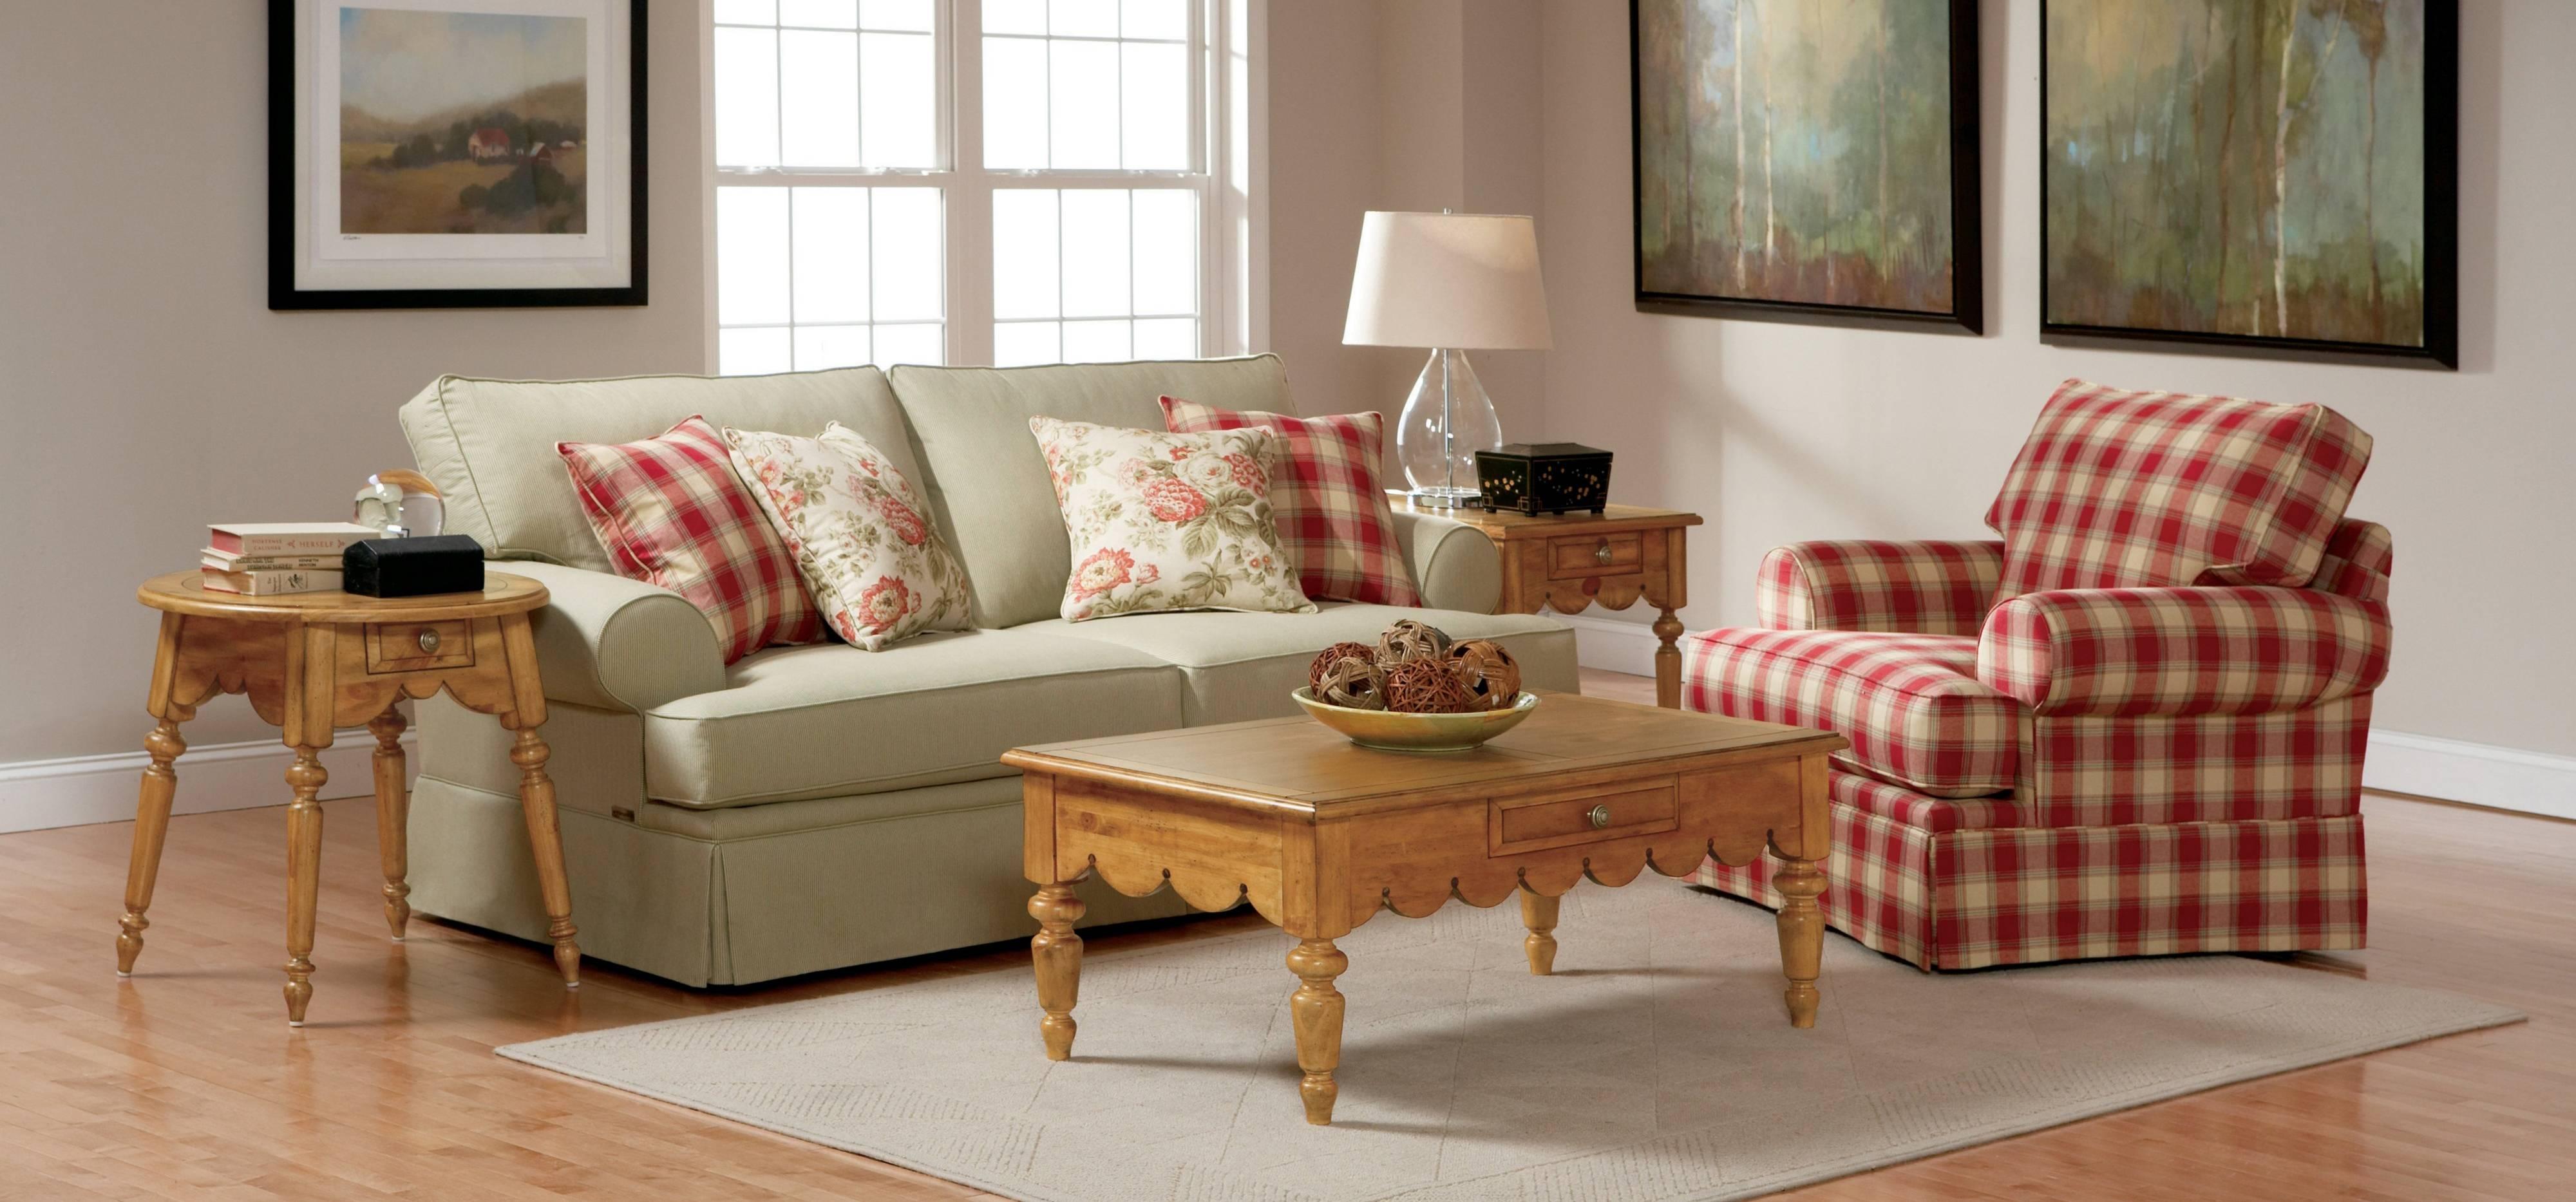 Broyhill Upholstery – Jordan Furniture Inside Broyhill Emily Sofas (View 9 of 15)